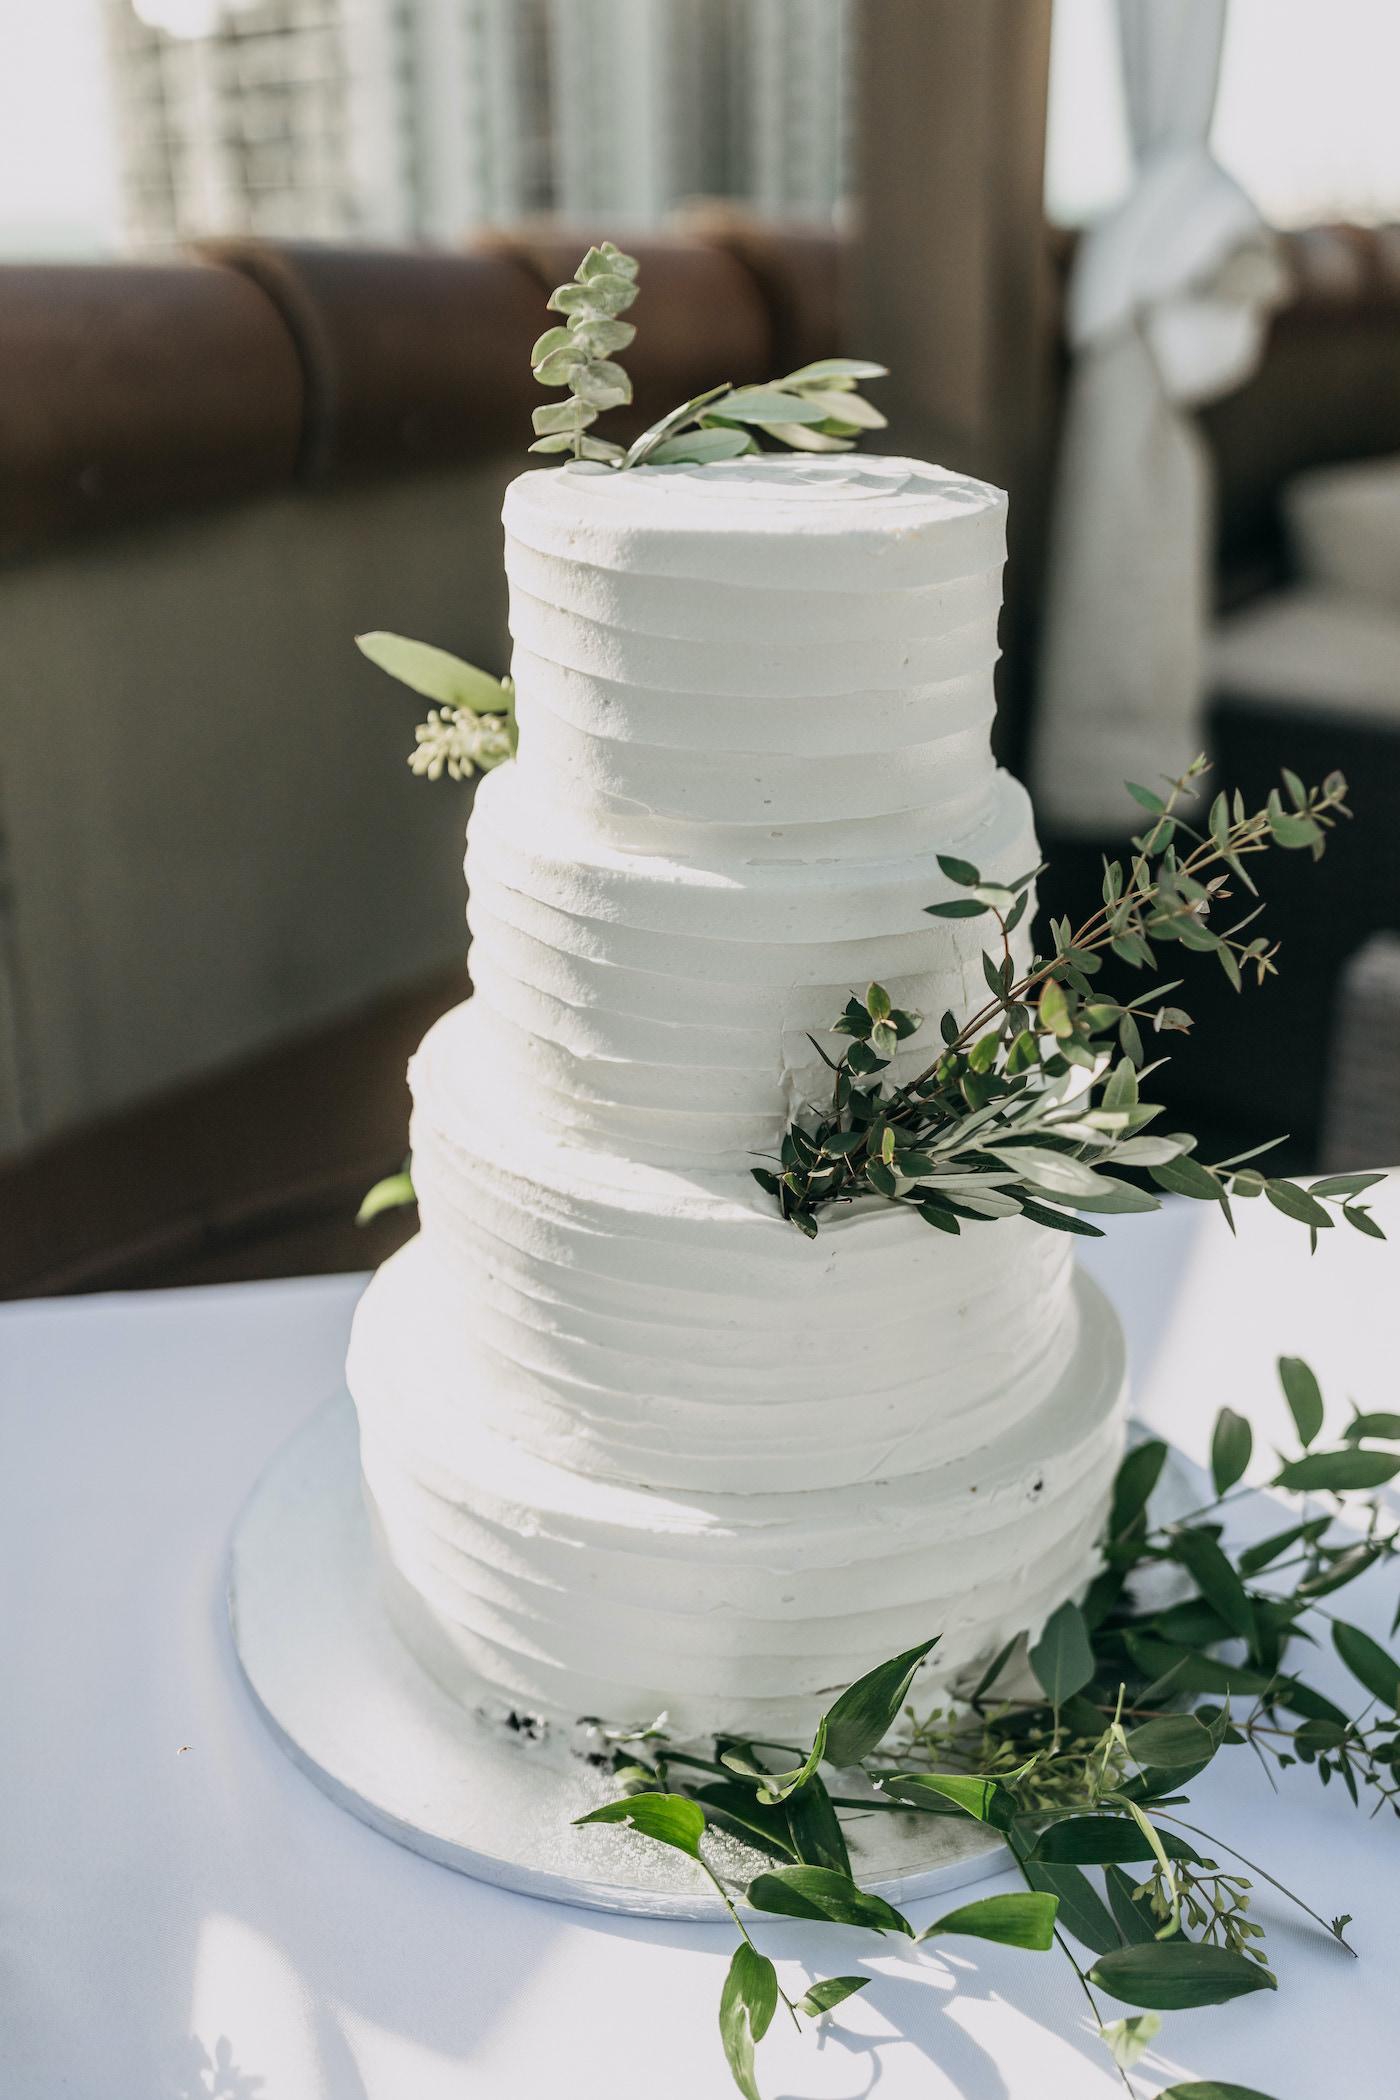 Classic Four Tier Wedding Cake, White Textured Publix Wedding Cake